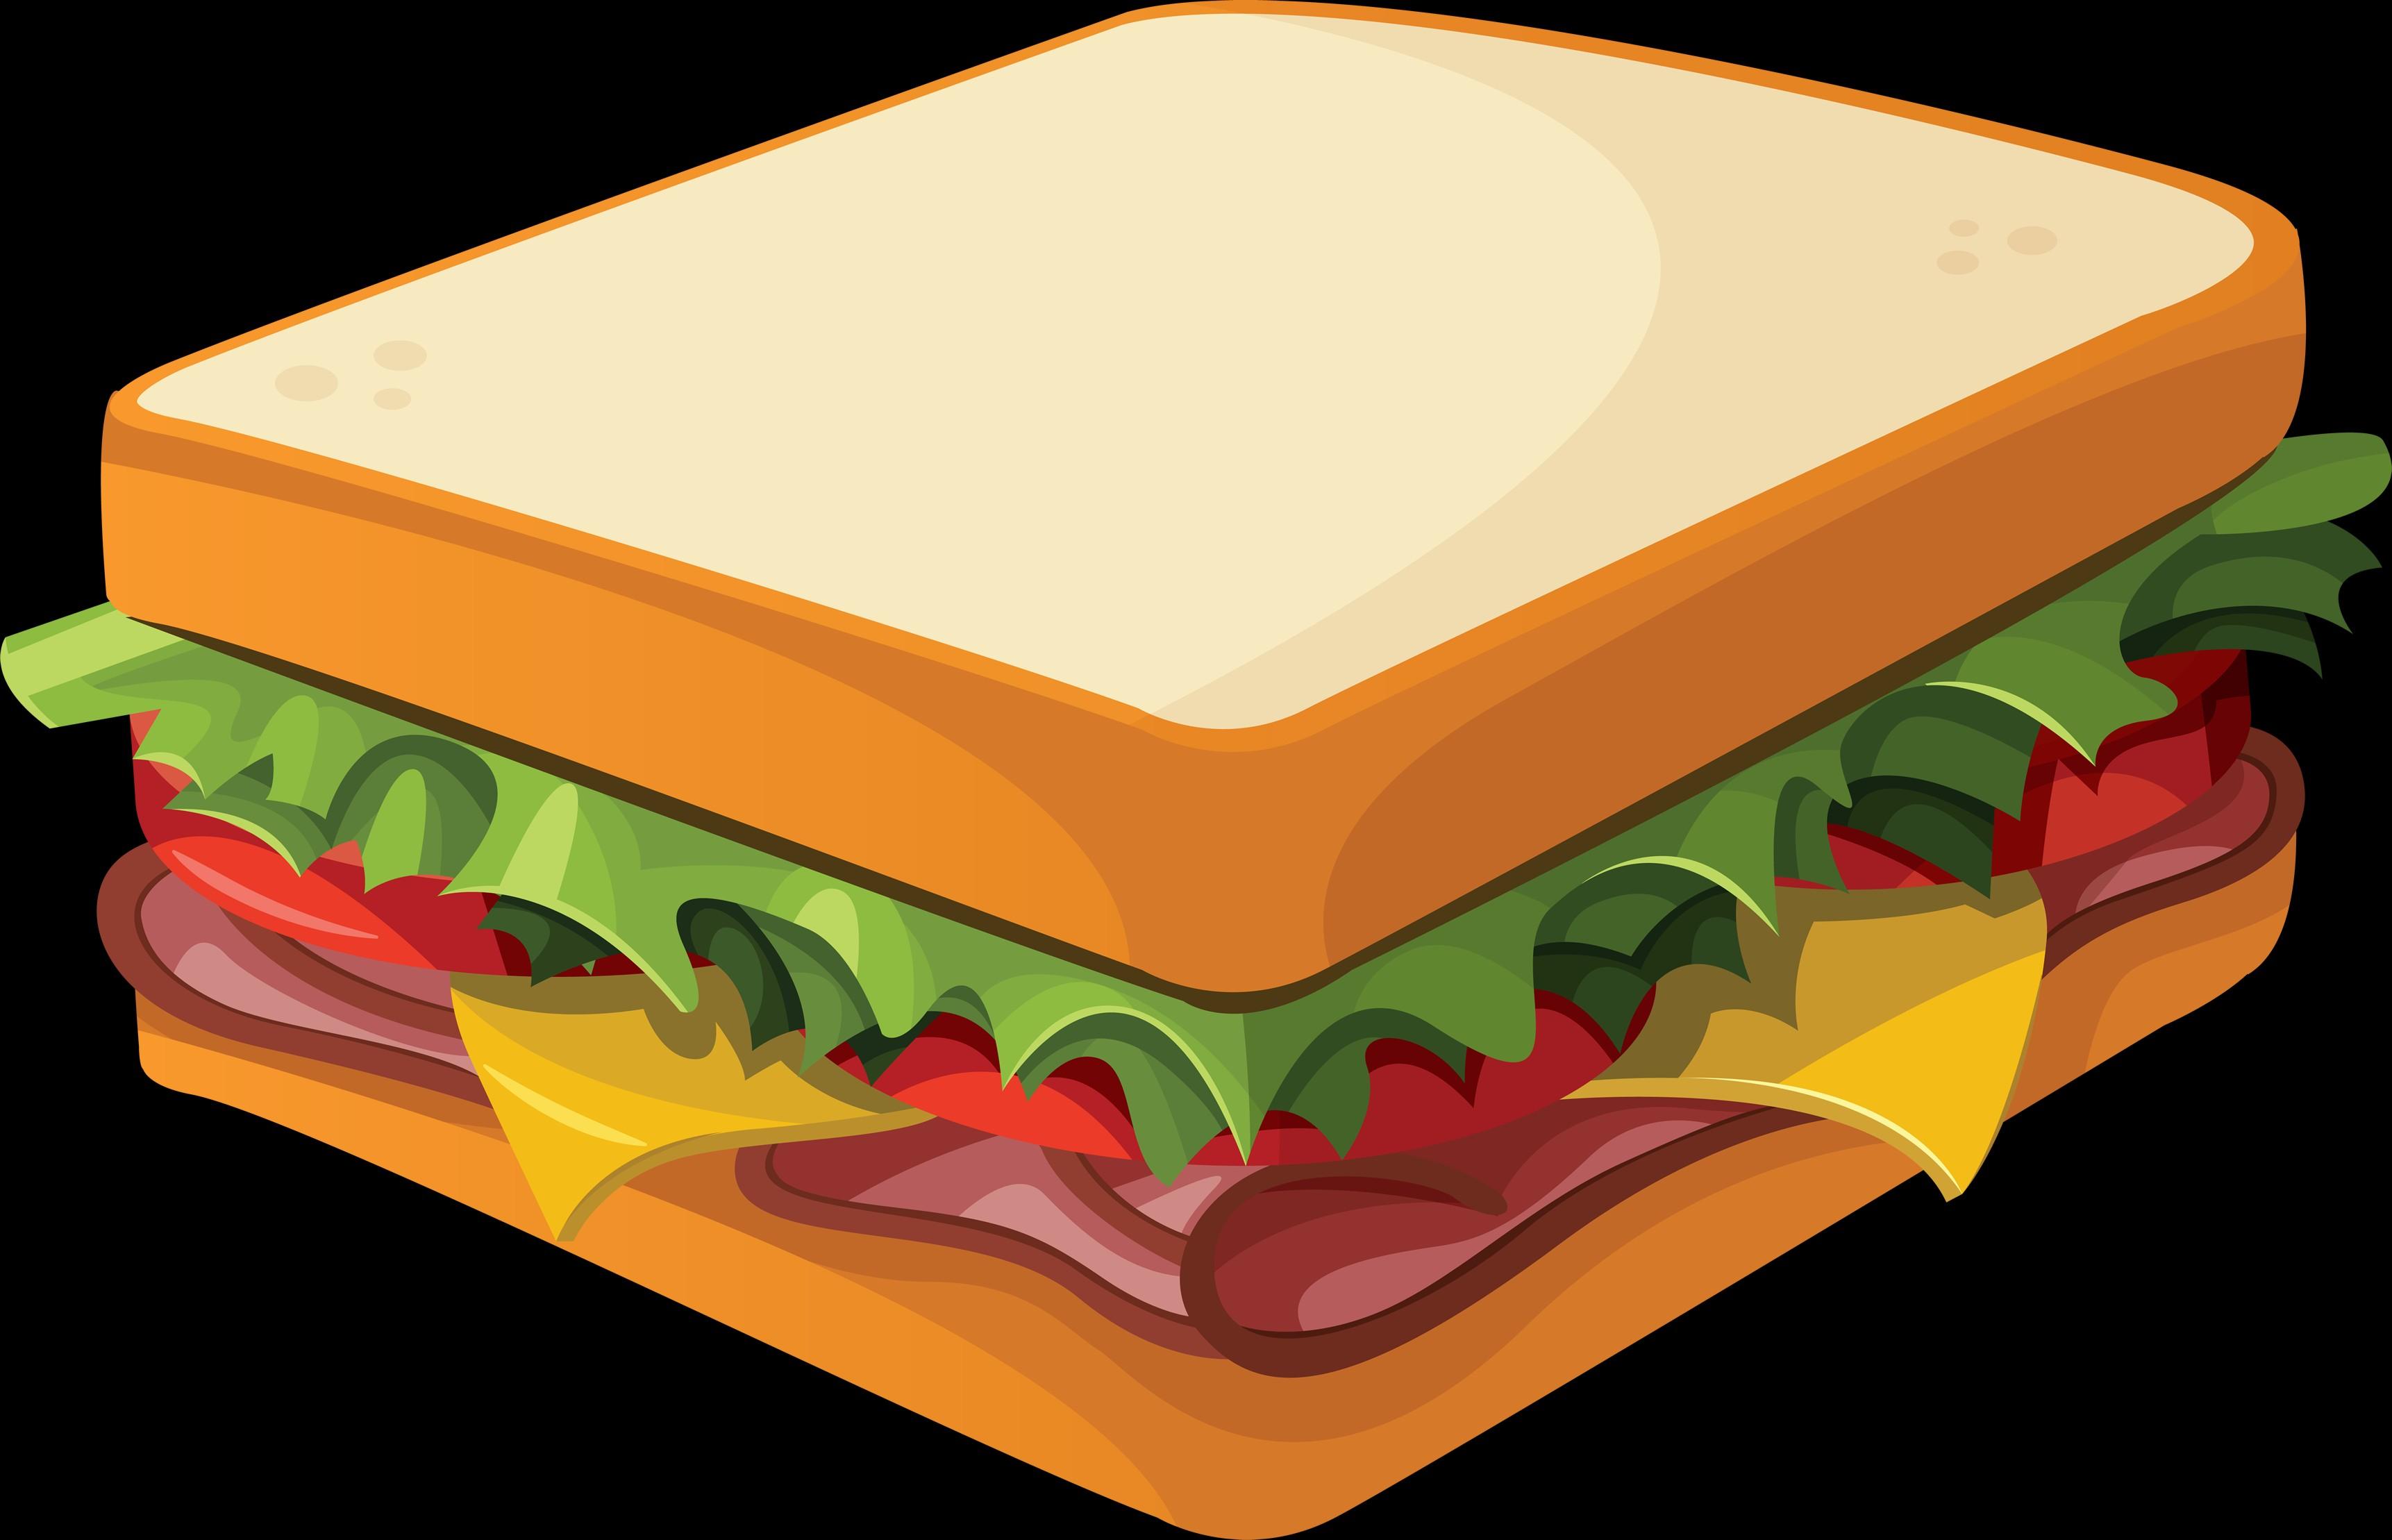 Sandwich Clipart #210.